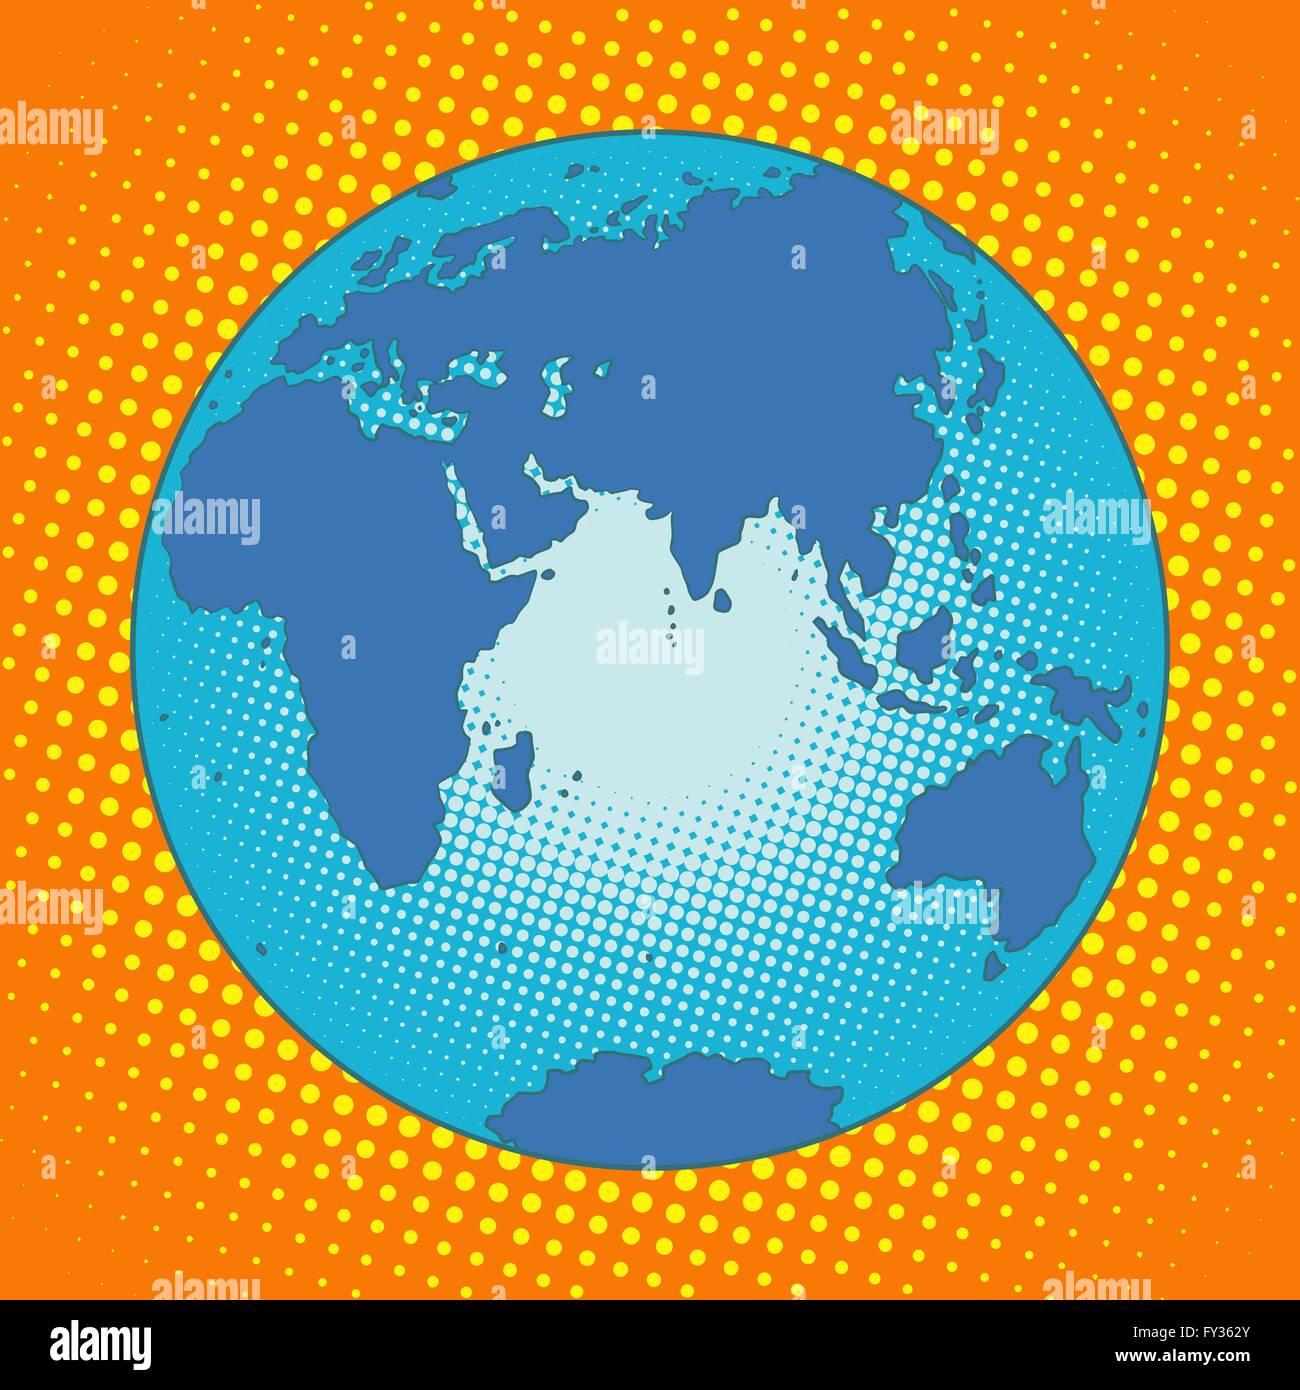 Earth Eurasia Africa Australia Antarctica Asia Europe - Stock Image